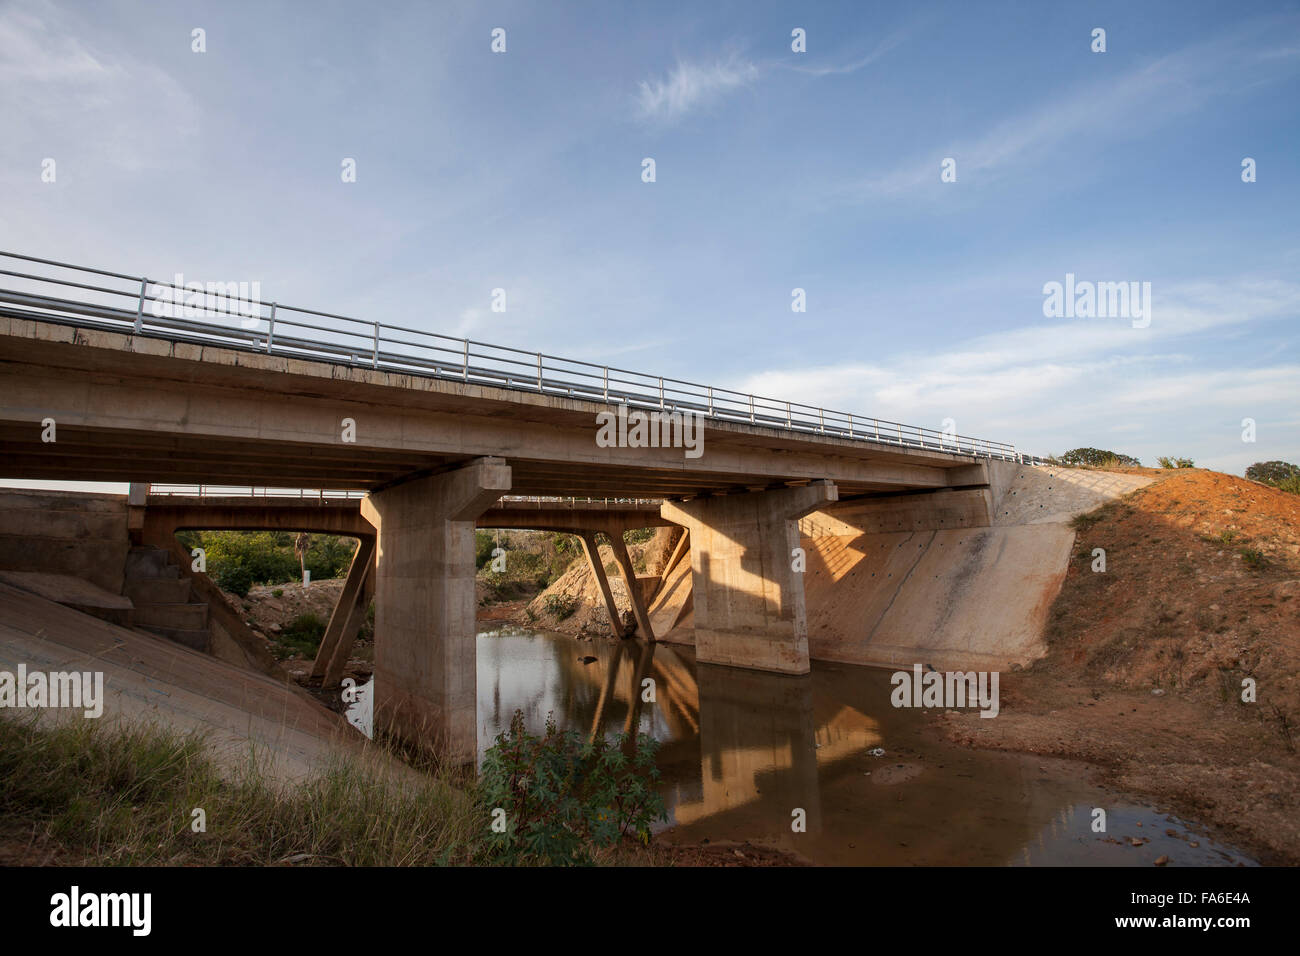 The newly-constructed Tanga – Horohoro trunk road stretches through NE Tanzania. - Stock Image